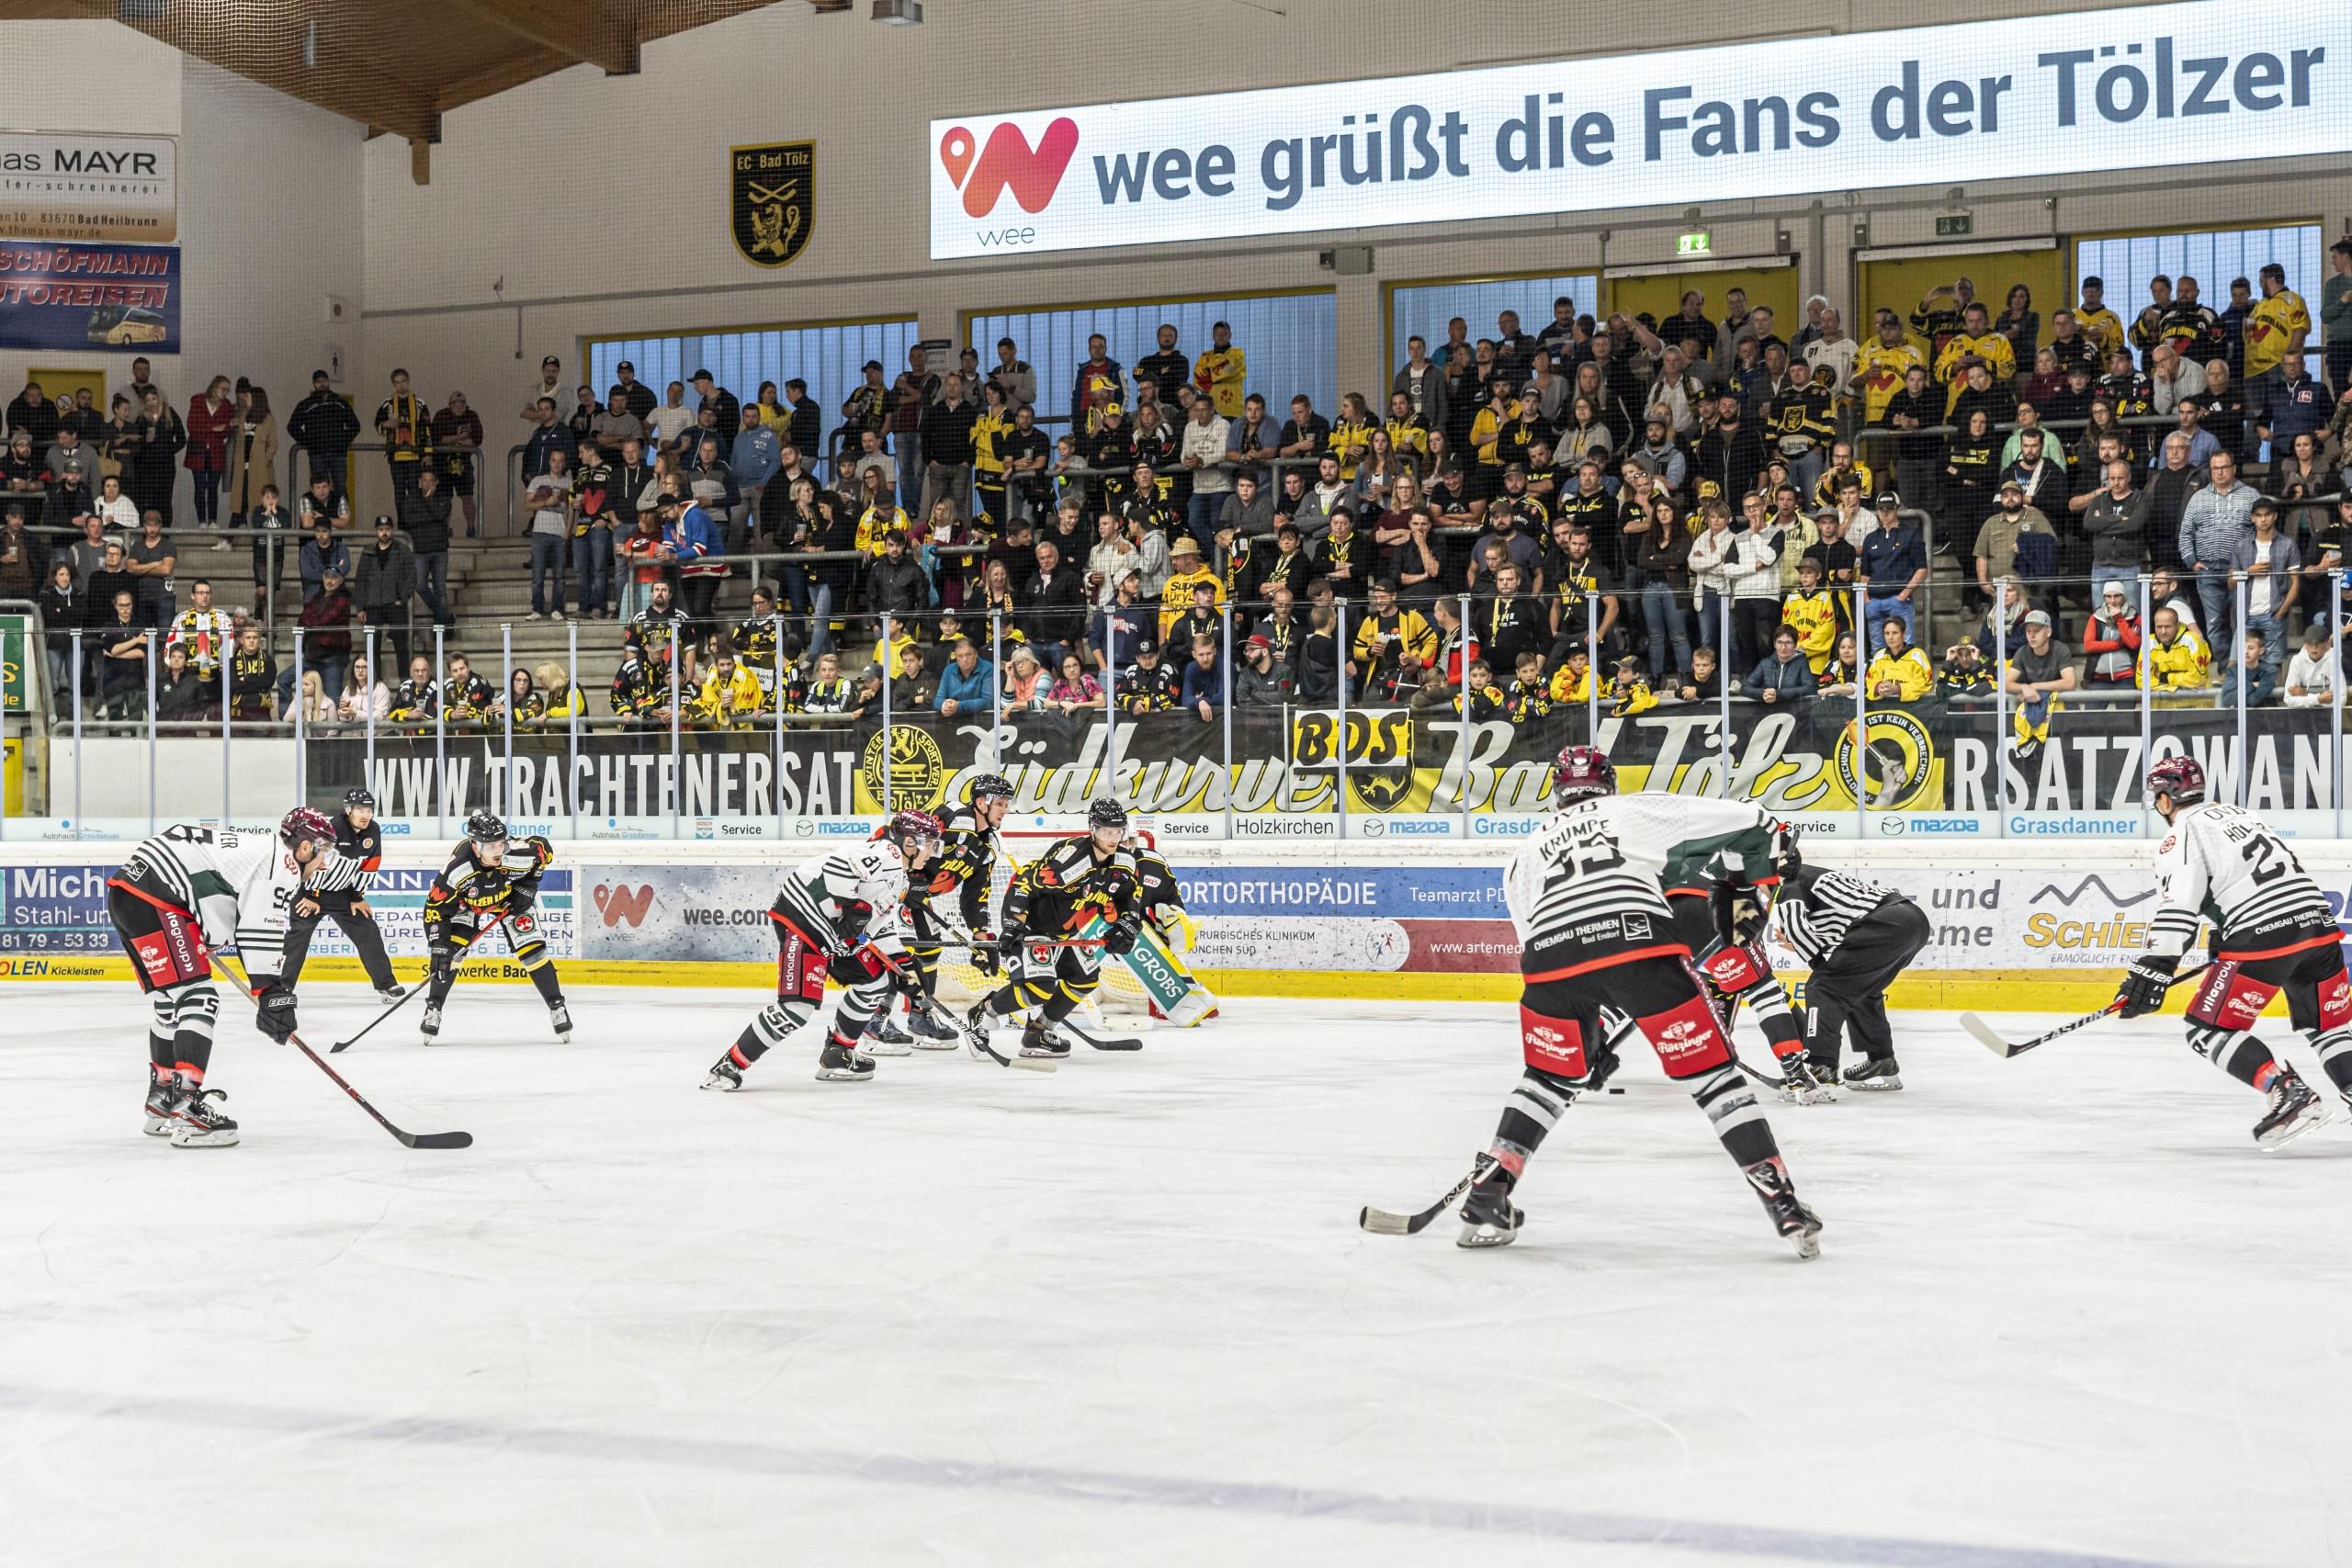 Eisstadion Bad Tölz